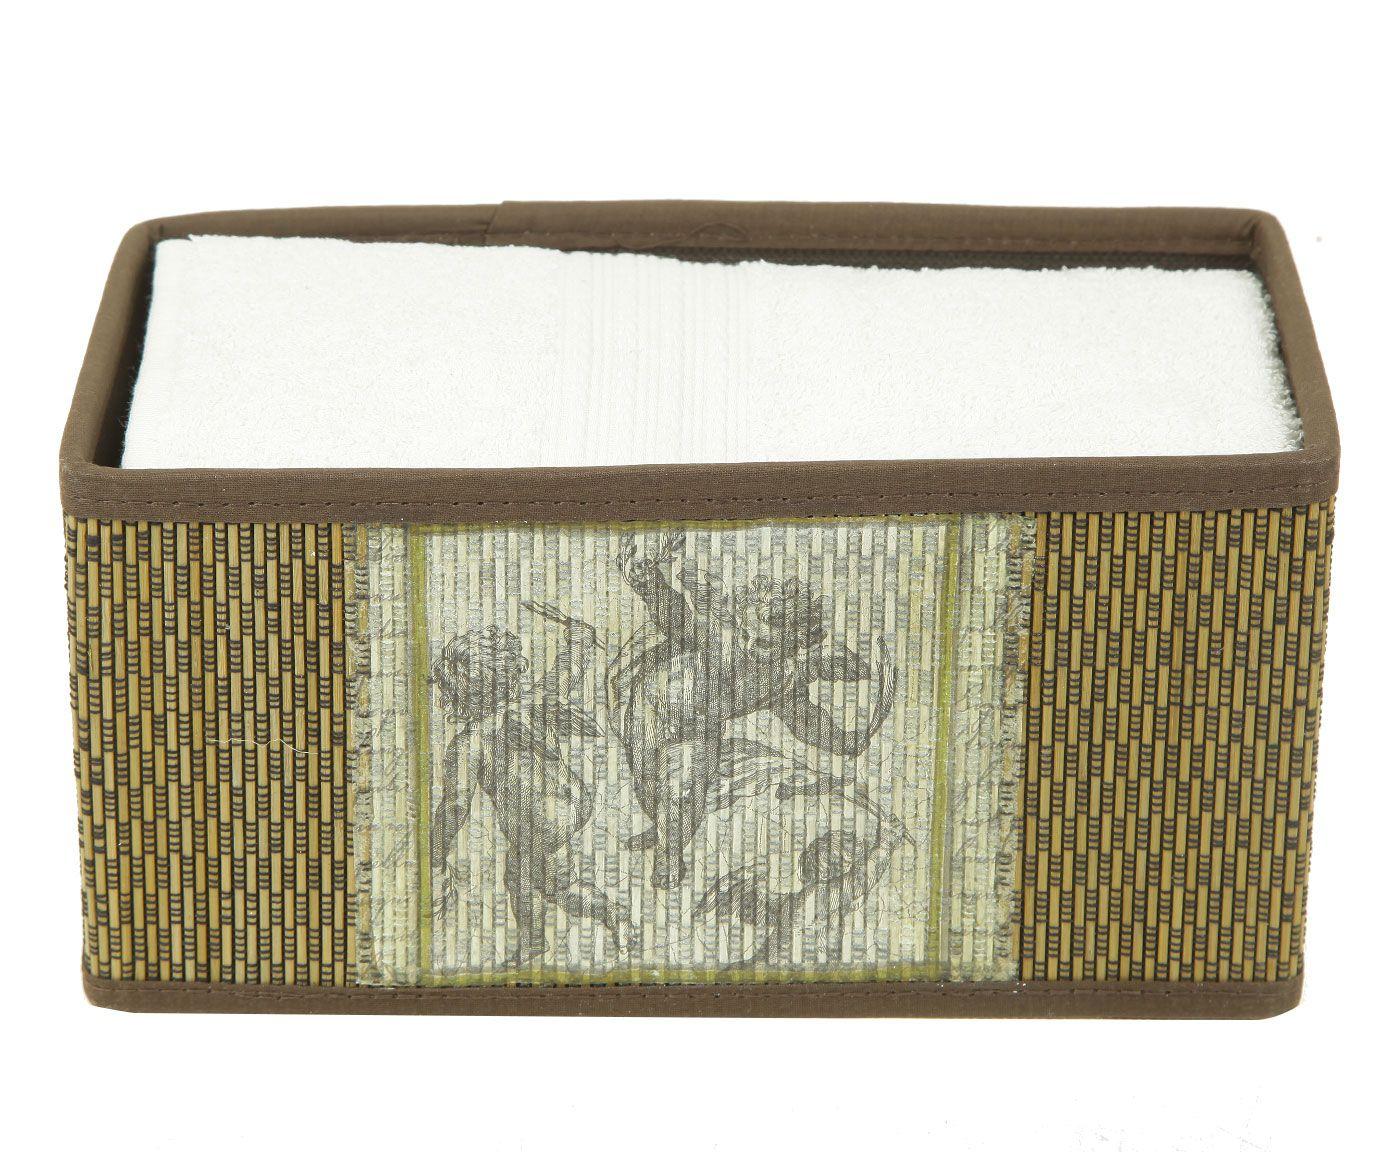 Полотенце банное Pastel Ангел, белый полотенца william roberts полотенце банное aberdeen цвет queen shadow серо голубой 70х140 см